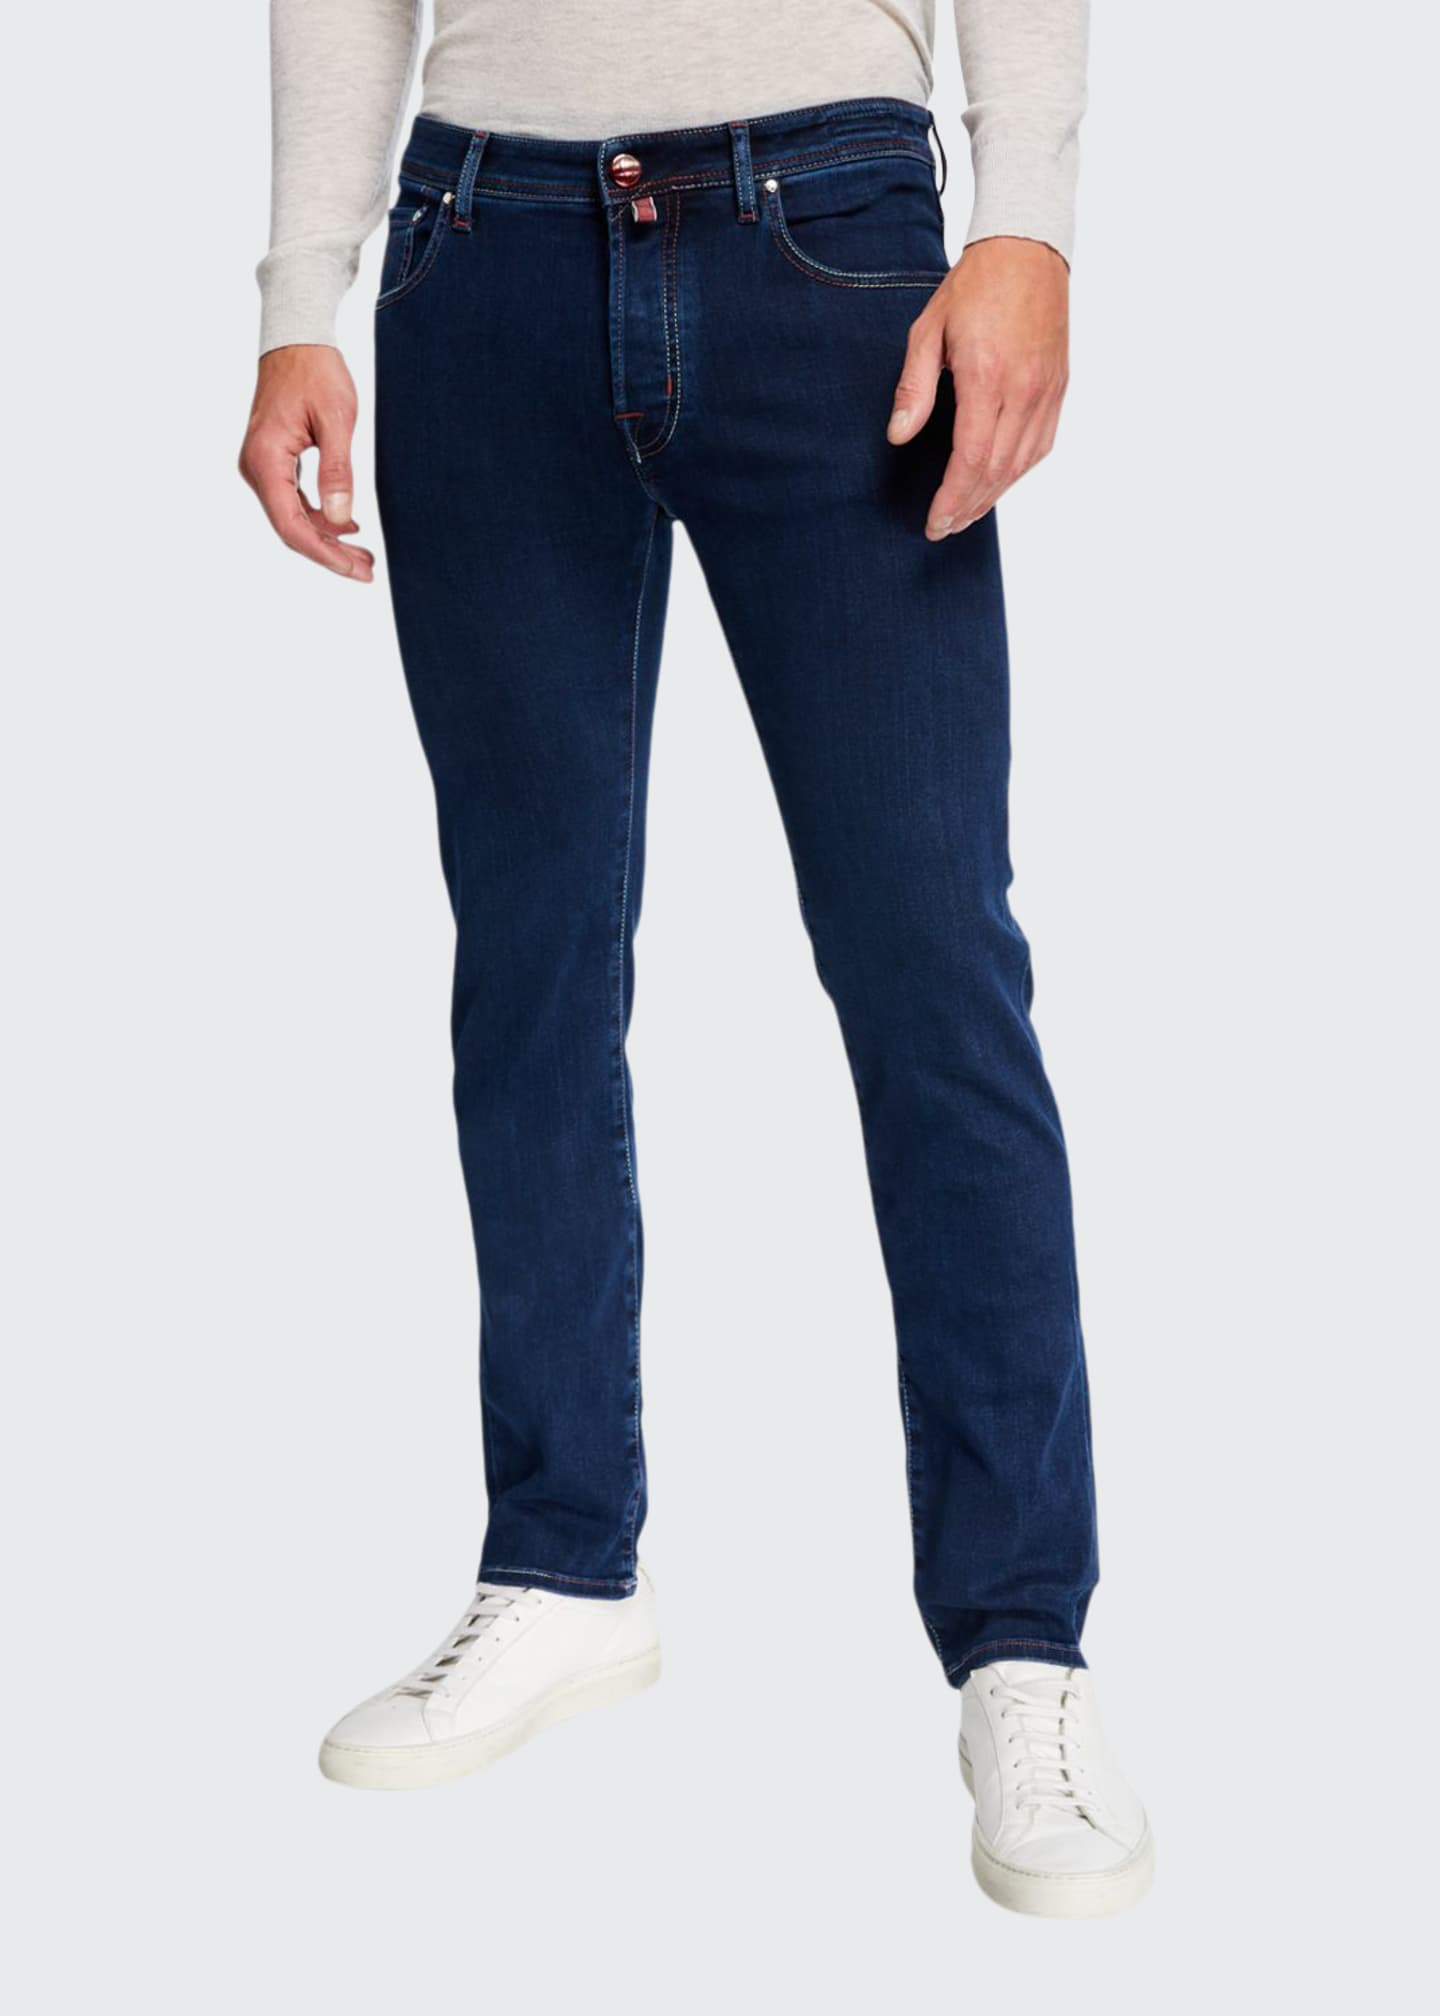 Jacob Cohen Men's Medium-Wash Tapered Jeans